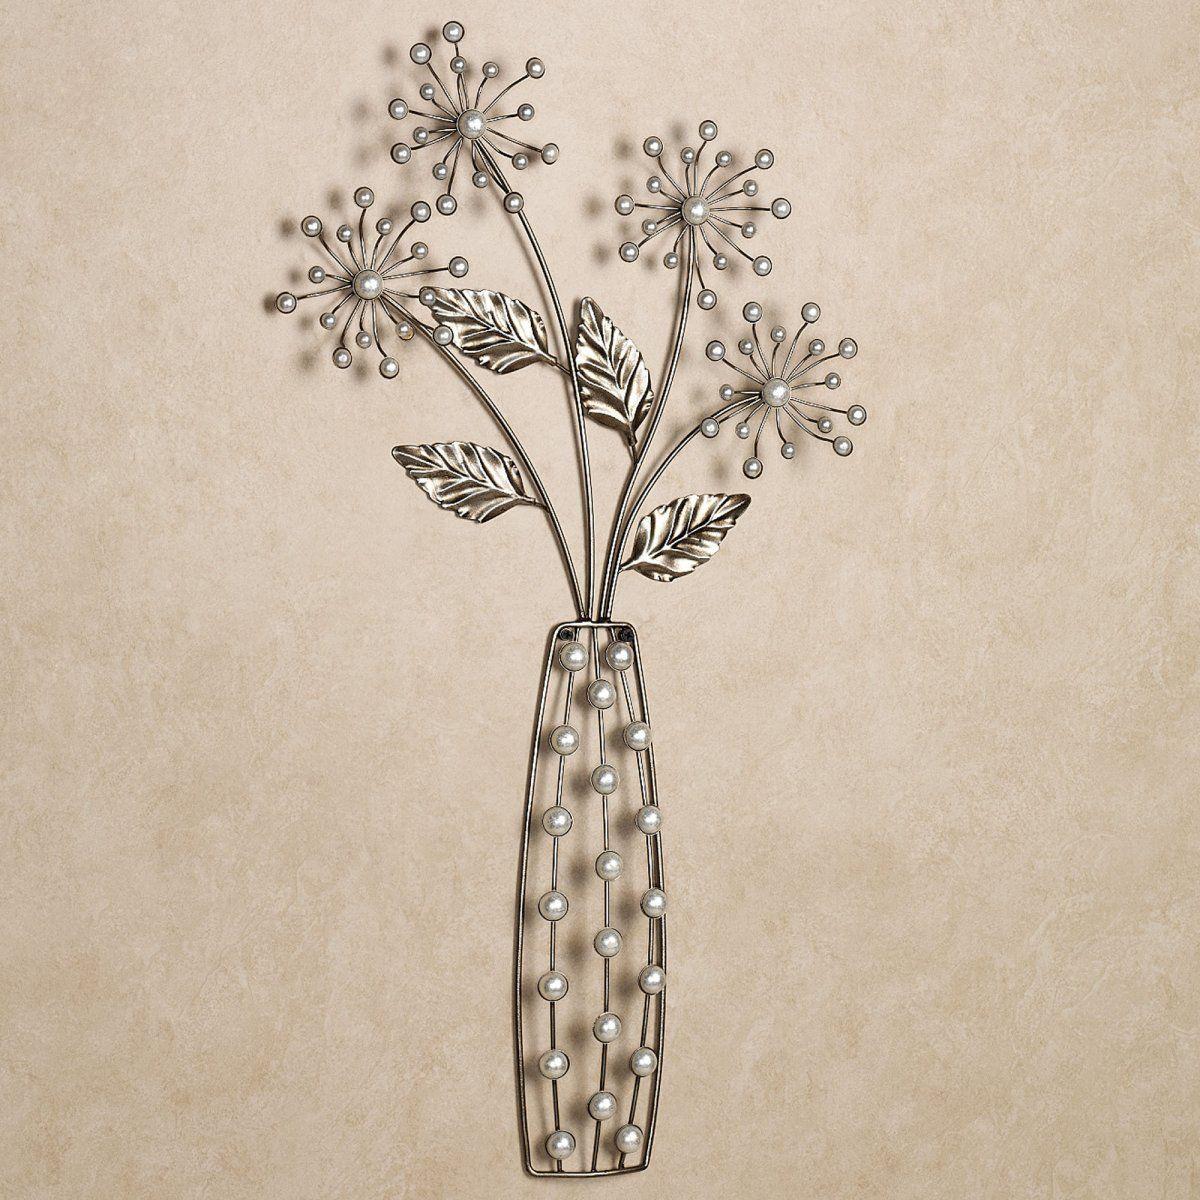 Elegant floral sensation metal wall art for living room decoration ideas decoration qdlake